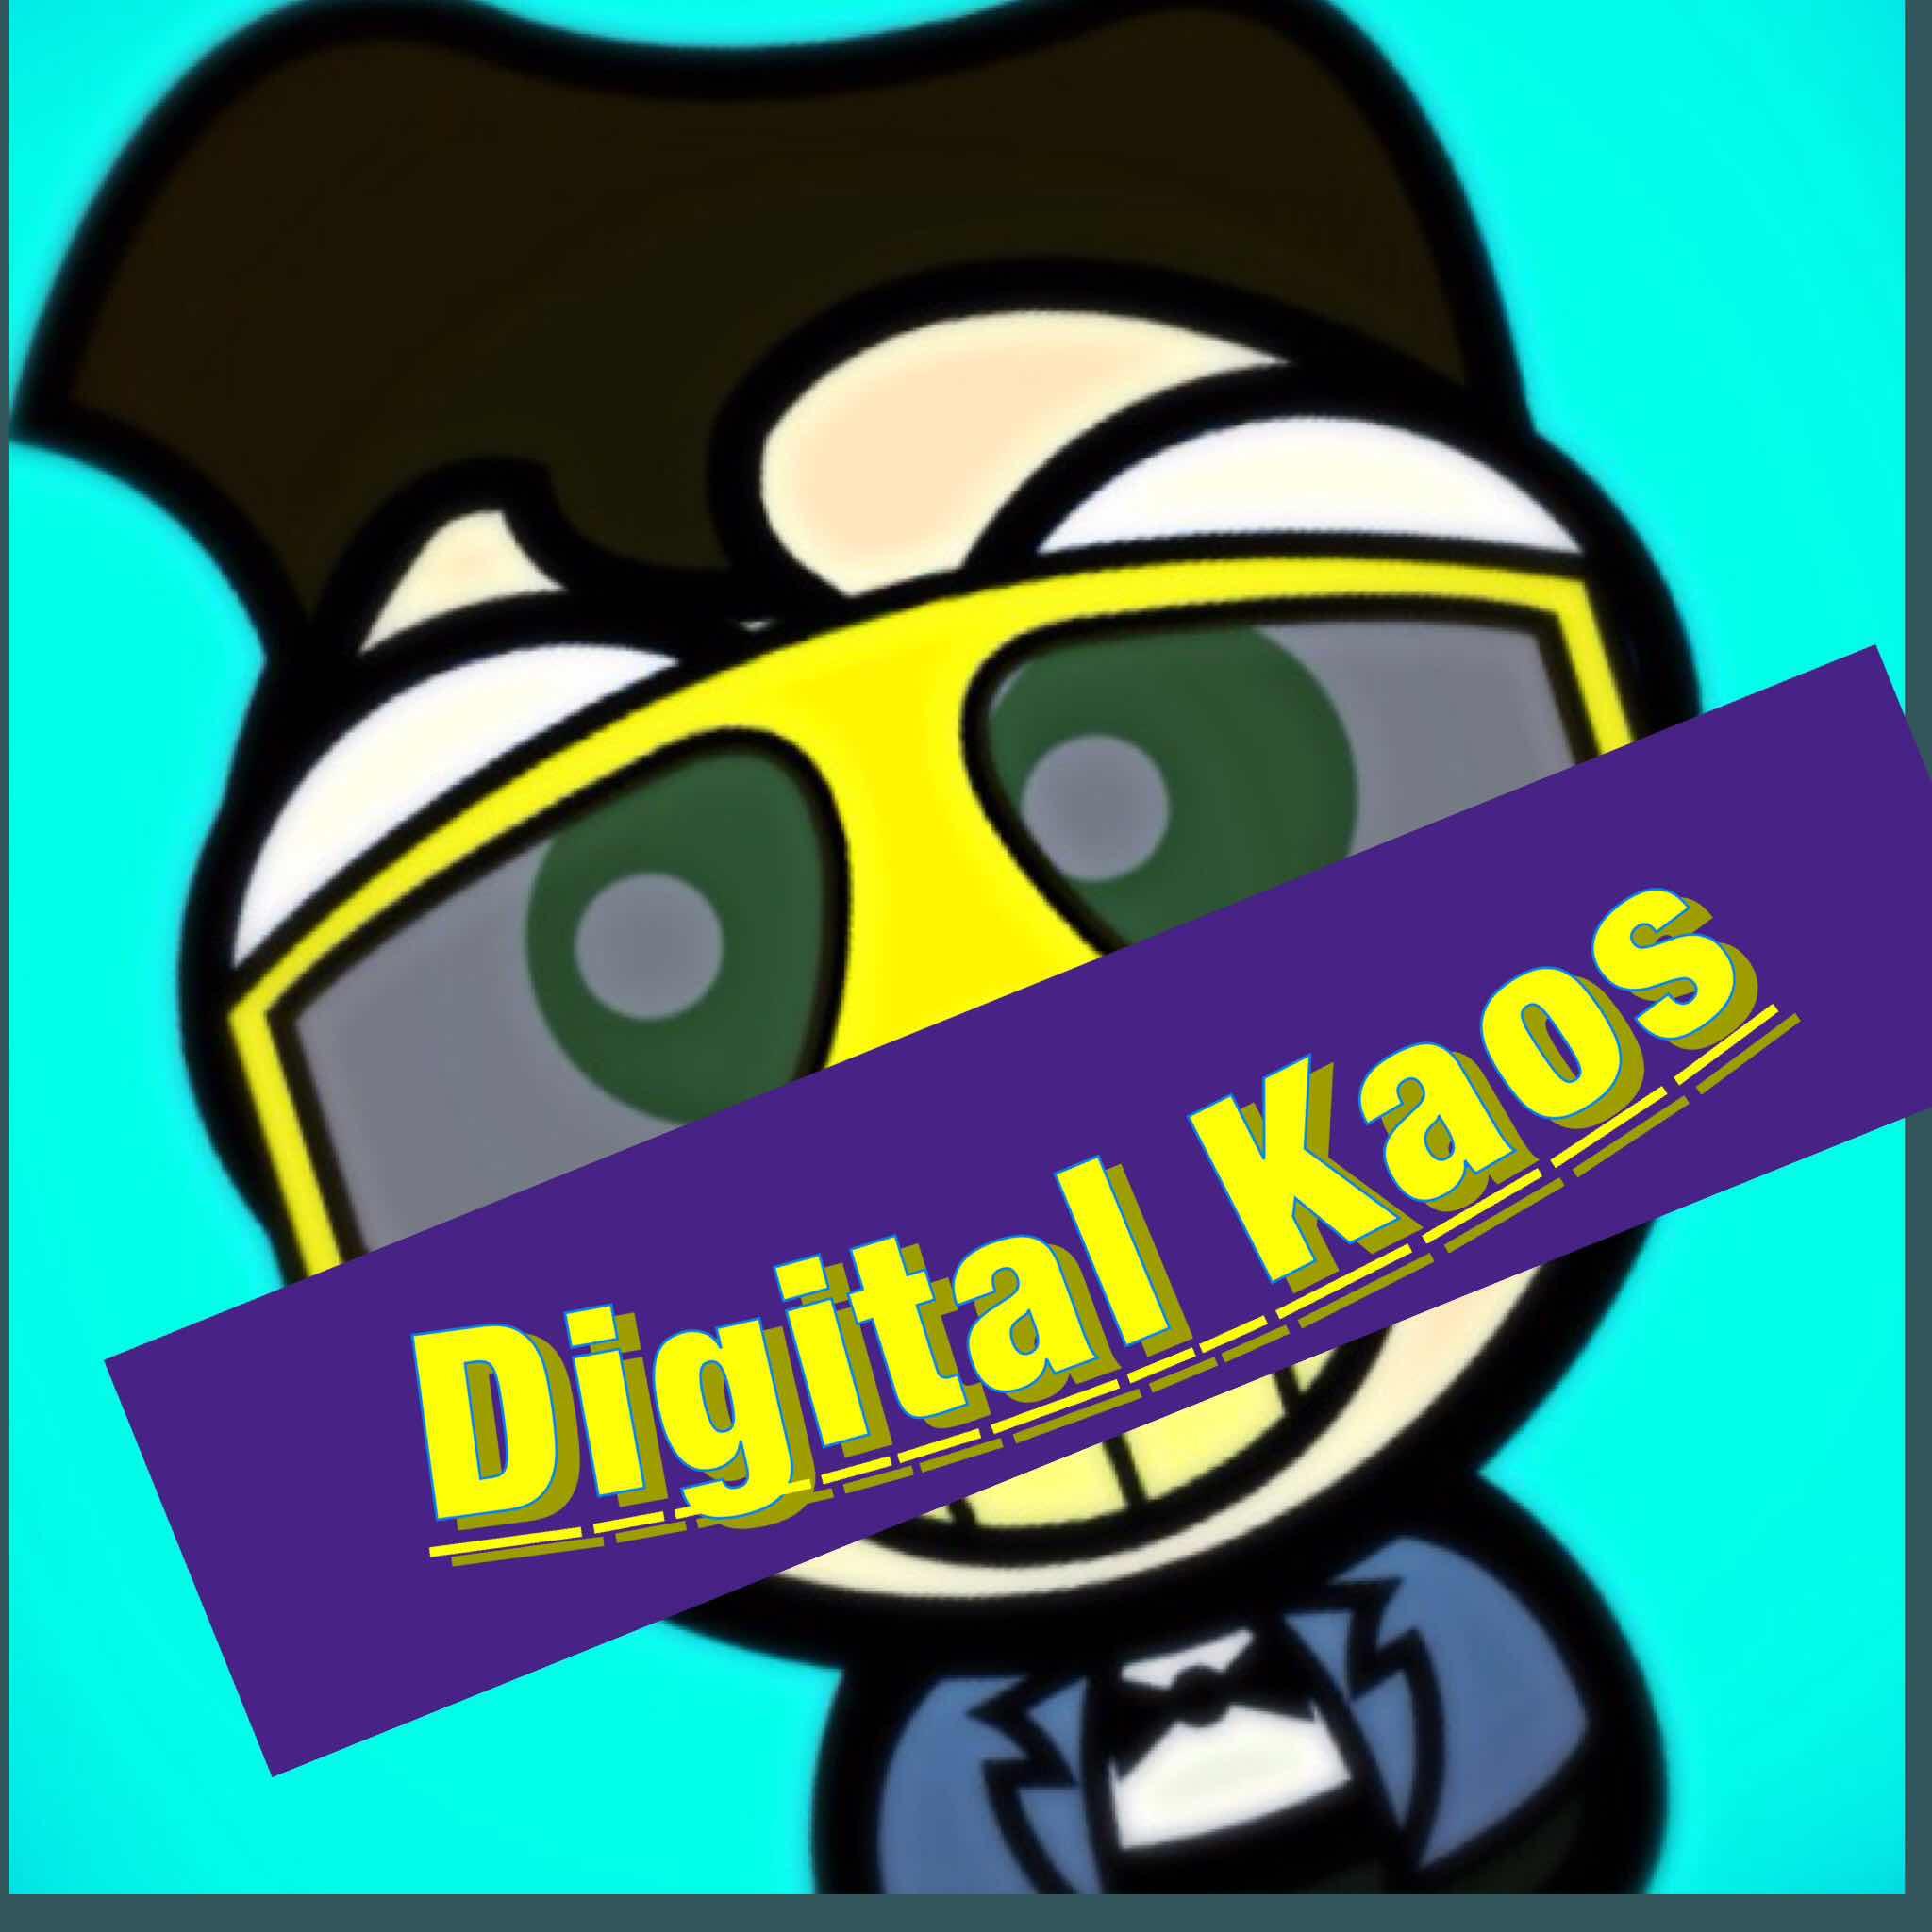 Digital Golds Kaotic News